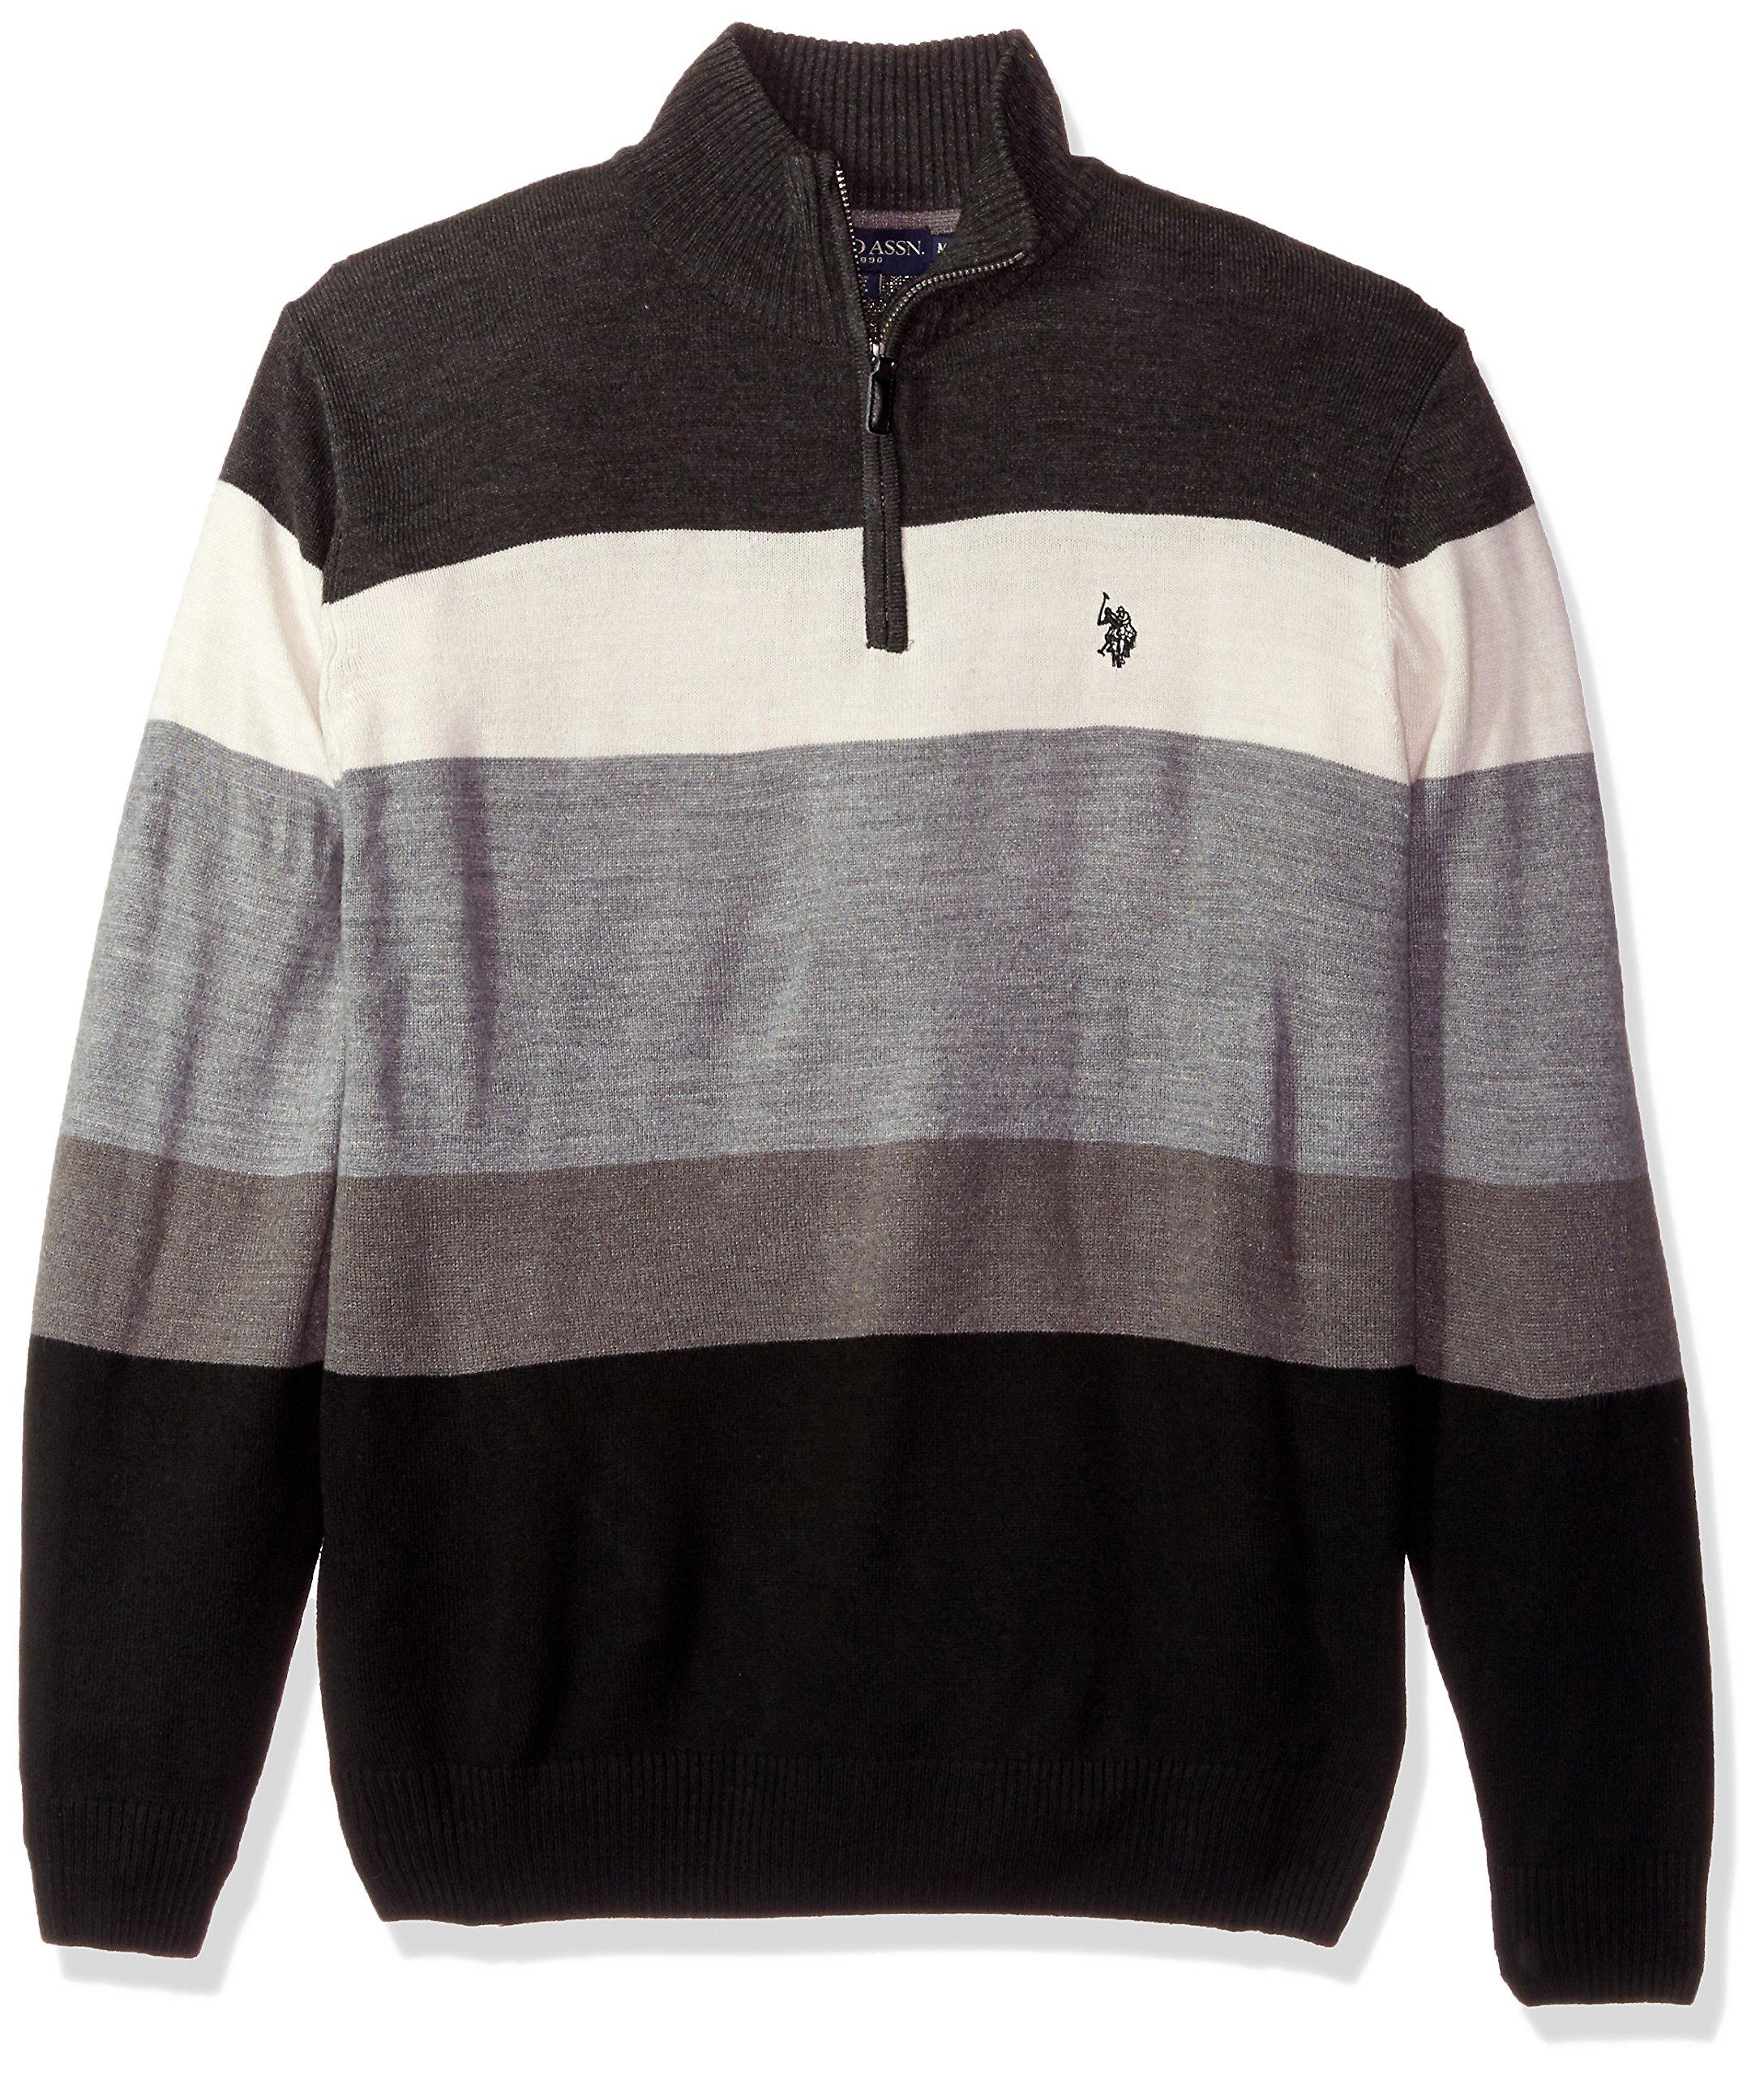 U.S. Polo Assn. Men's Double Striped 1/4 Zip Sweater, Charcoal Heather, Medium